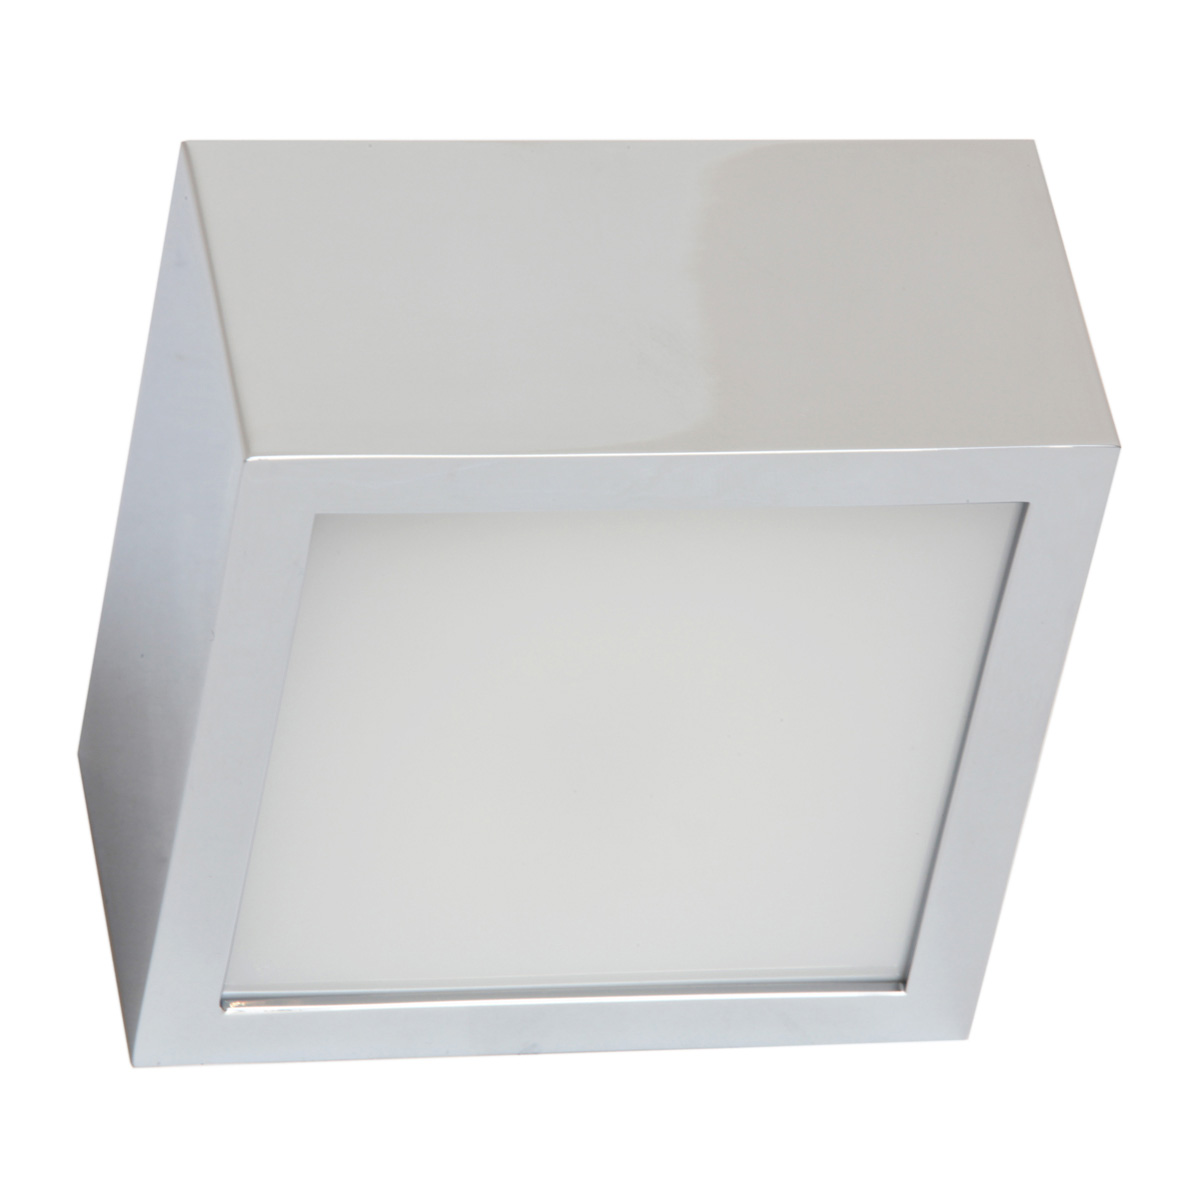 Karree Led Exklusive Badezimmer Deckenlampe Ip44 10 18 Cm Casa Lumi